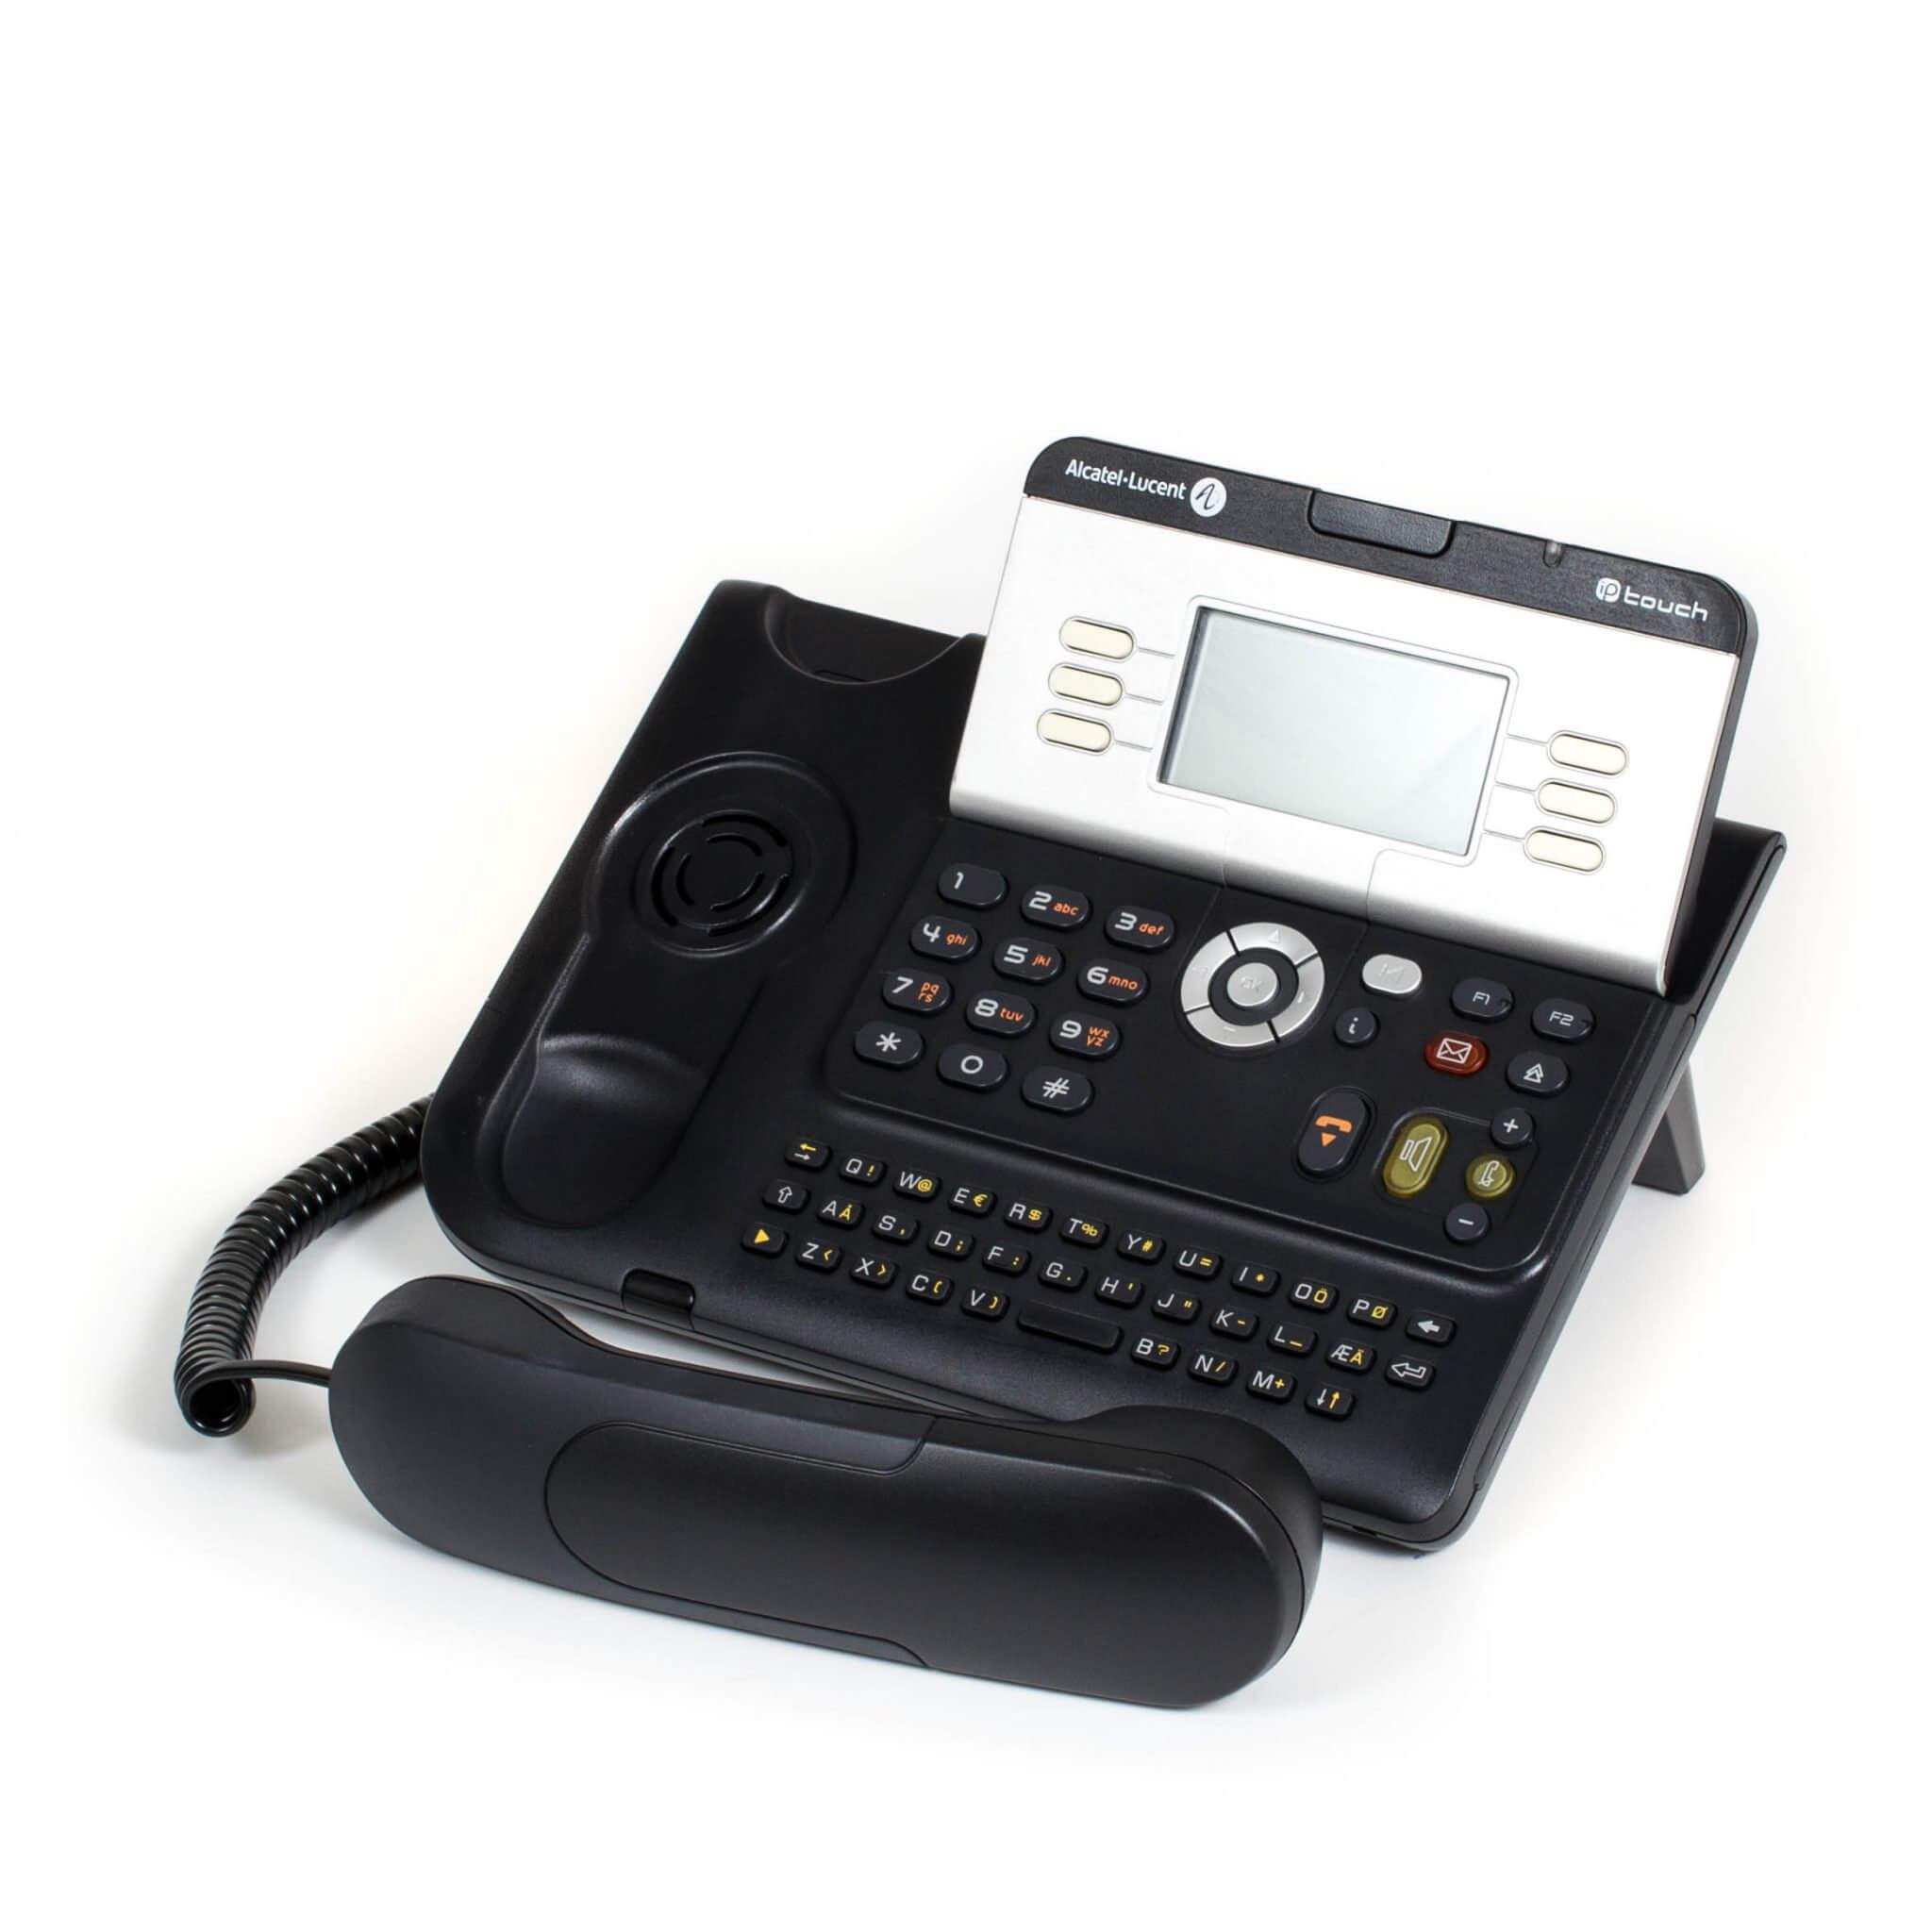 Alcatel ip 4028 manual